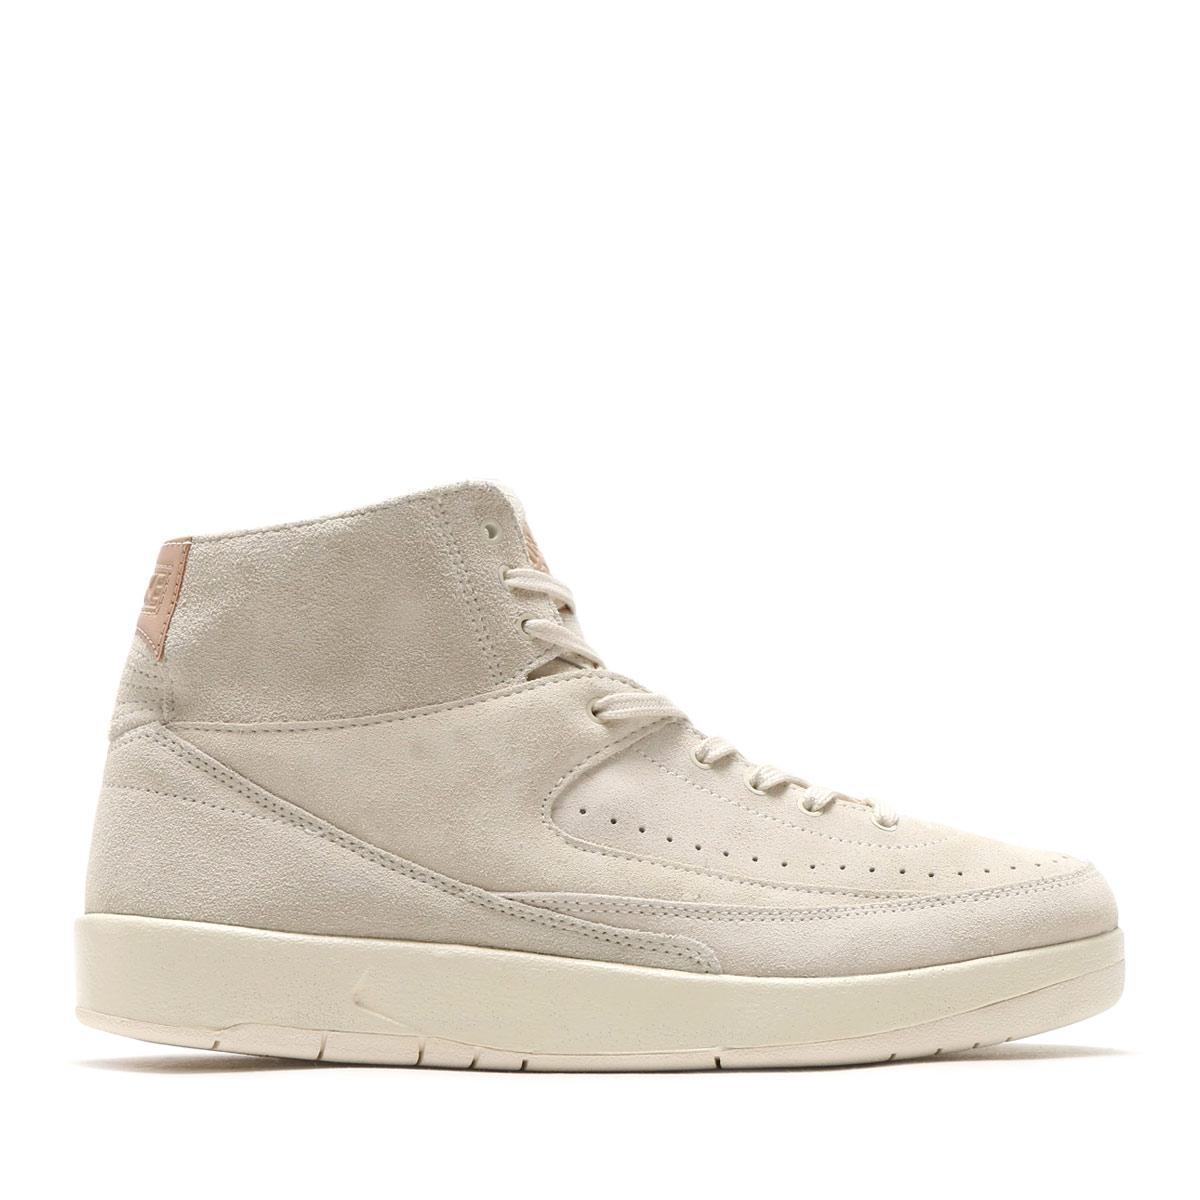 45db3dbe126 ... NIKE AIR JORDAN 2 RETRO DECON (Nike Air Jordan 2 nostalgic DECON) (SAIL  ...